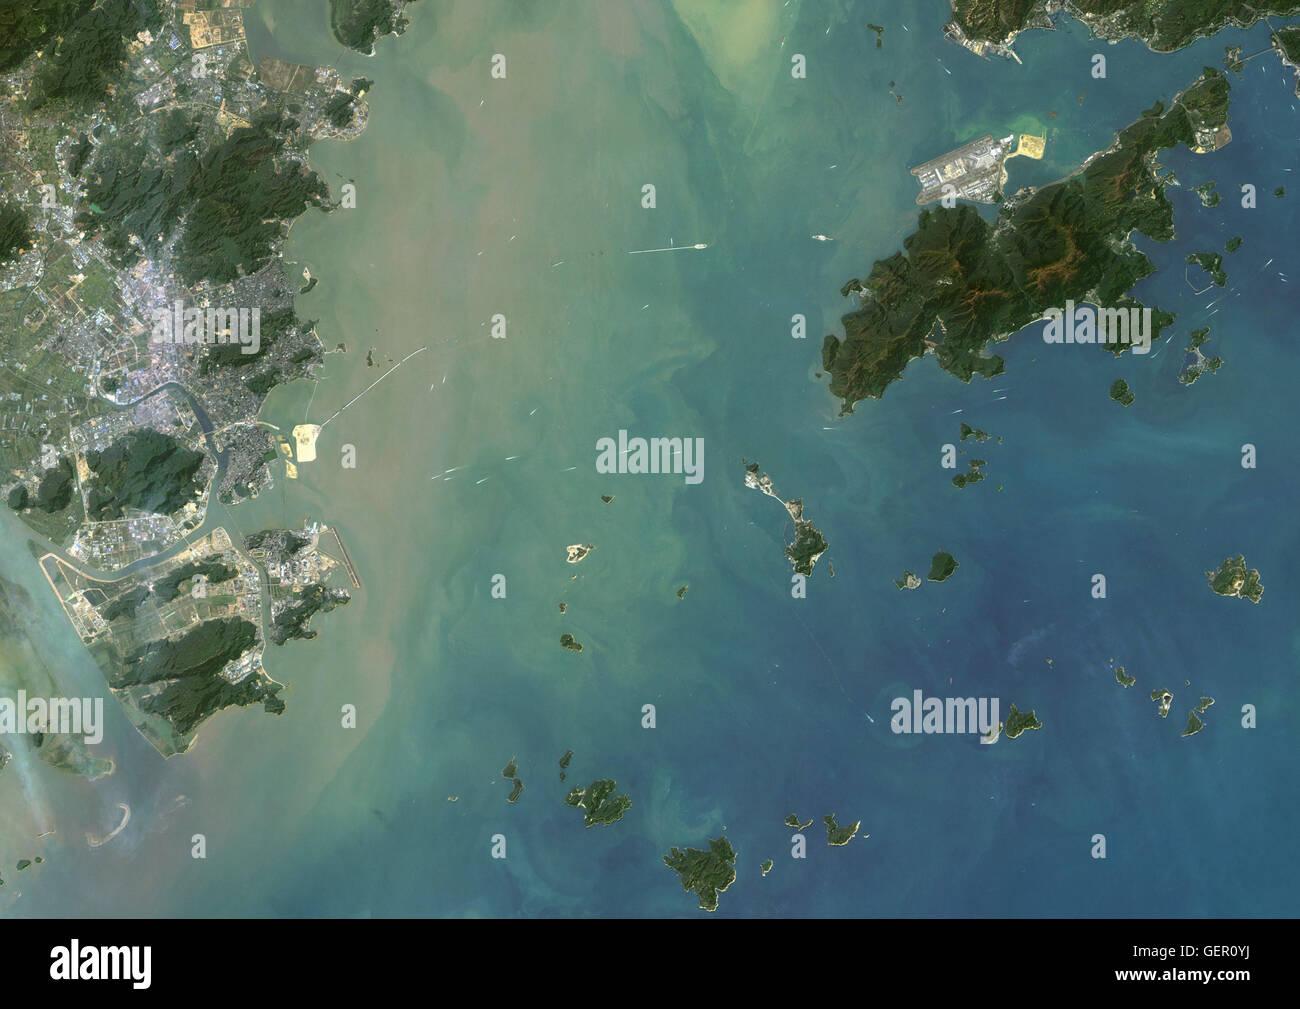 Satellite view of Hong Kong and Macau. The Hong Kong–Zhuhai–Macau Bridge which consists of a series of bridges and - Stock Image